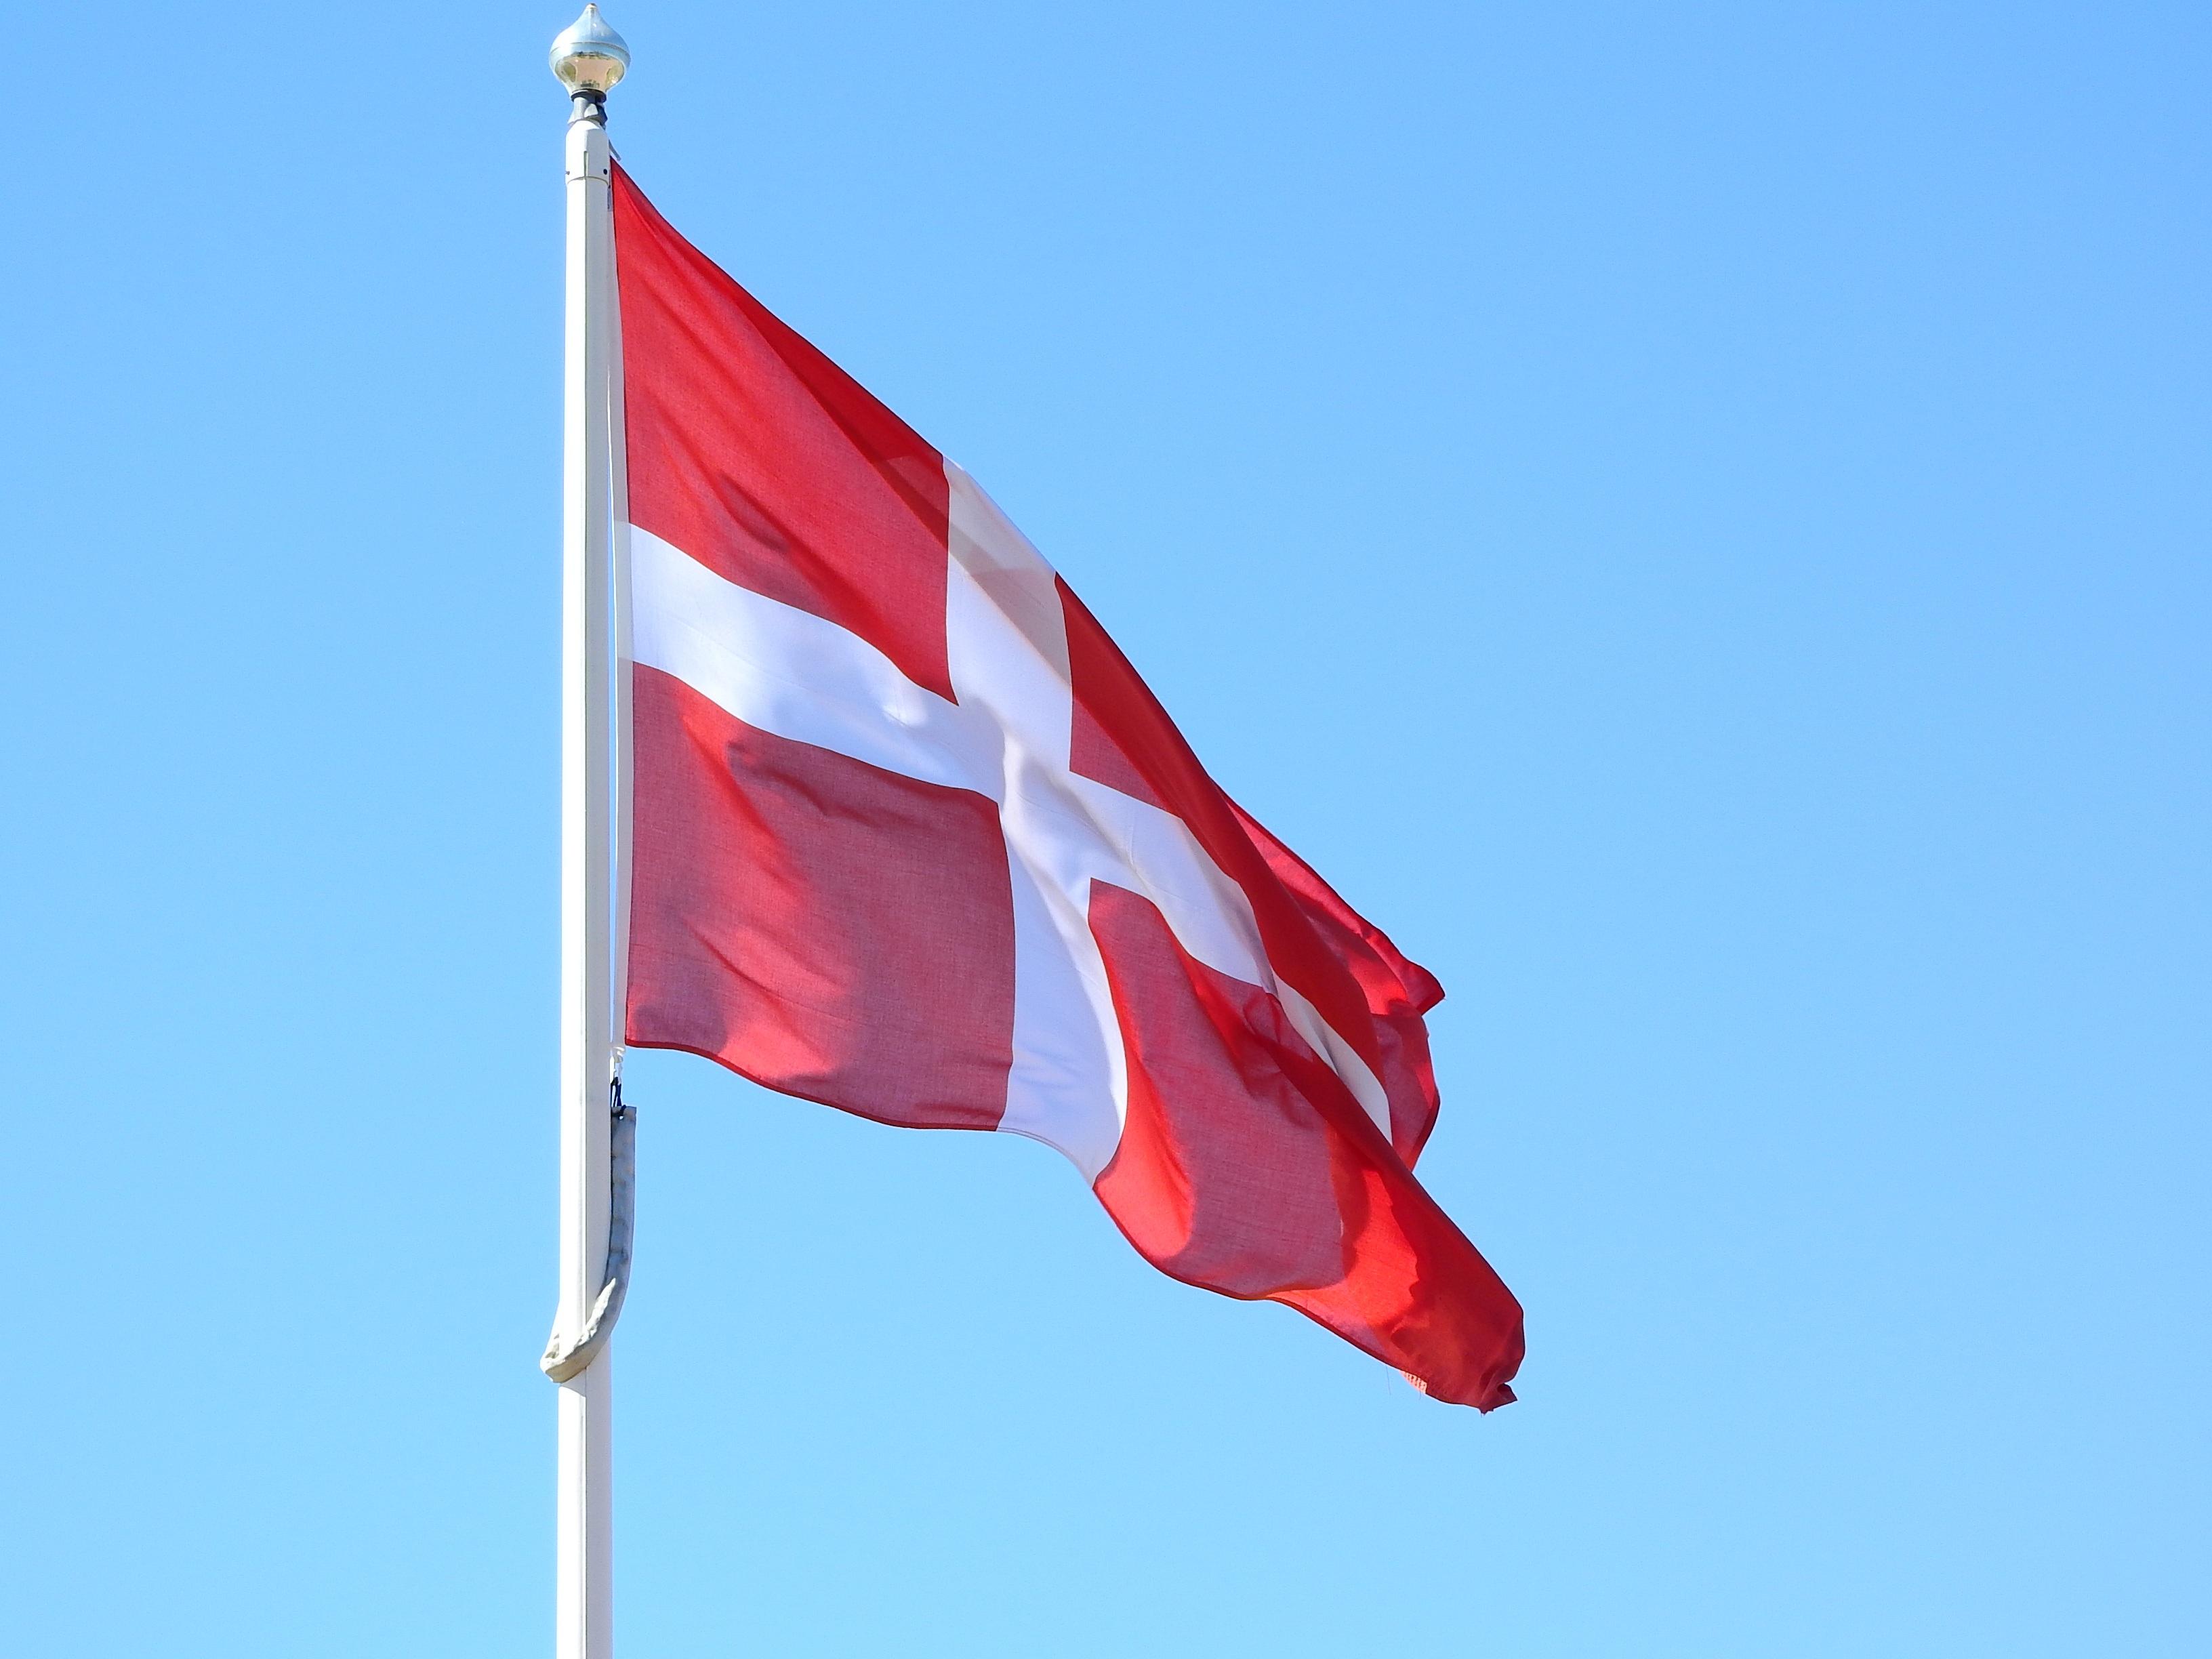 Gratis billeder : himmel, vind, rød, Danmark, rødt flag, dansk flag, flag USA, danske kongerige ...